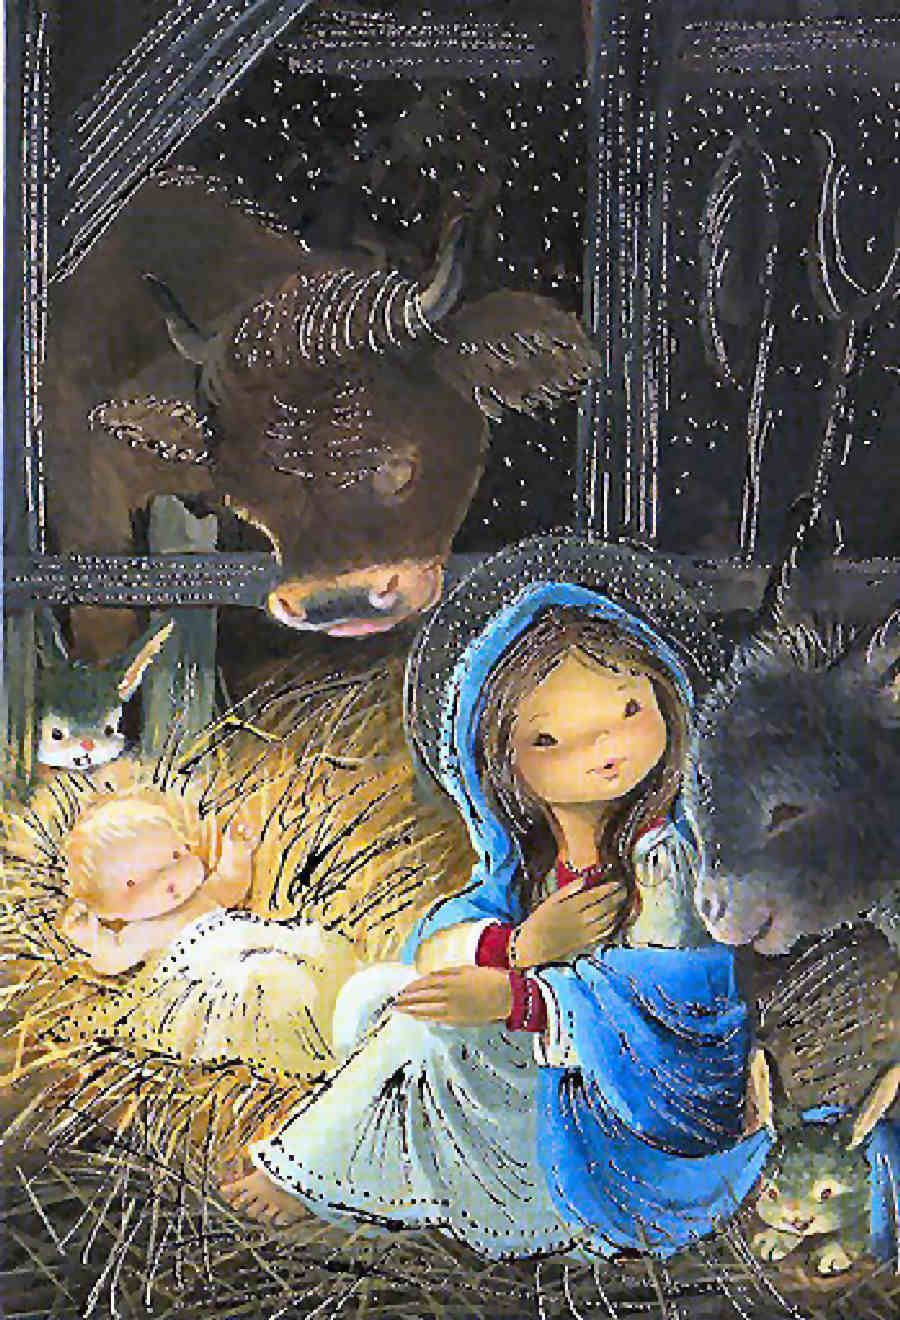 Pesebres ilustraciones navidad | Navidad | Pinterest | Pesebre ...